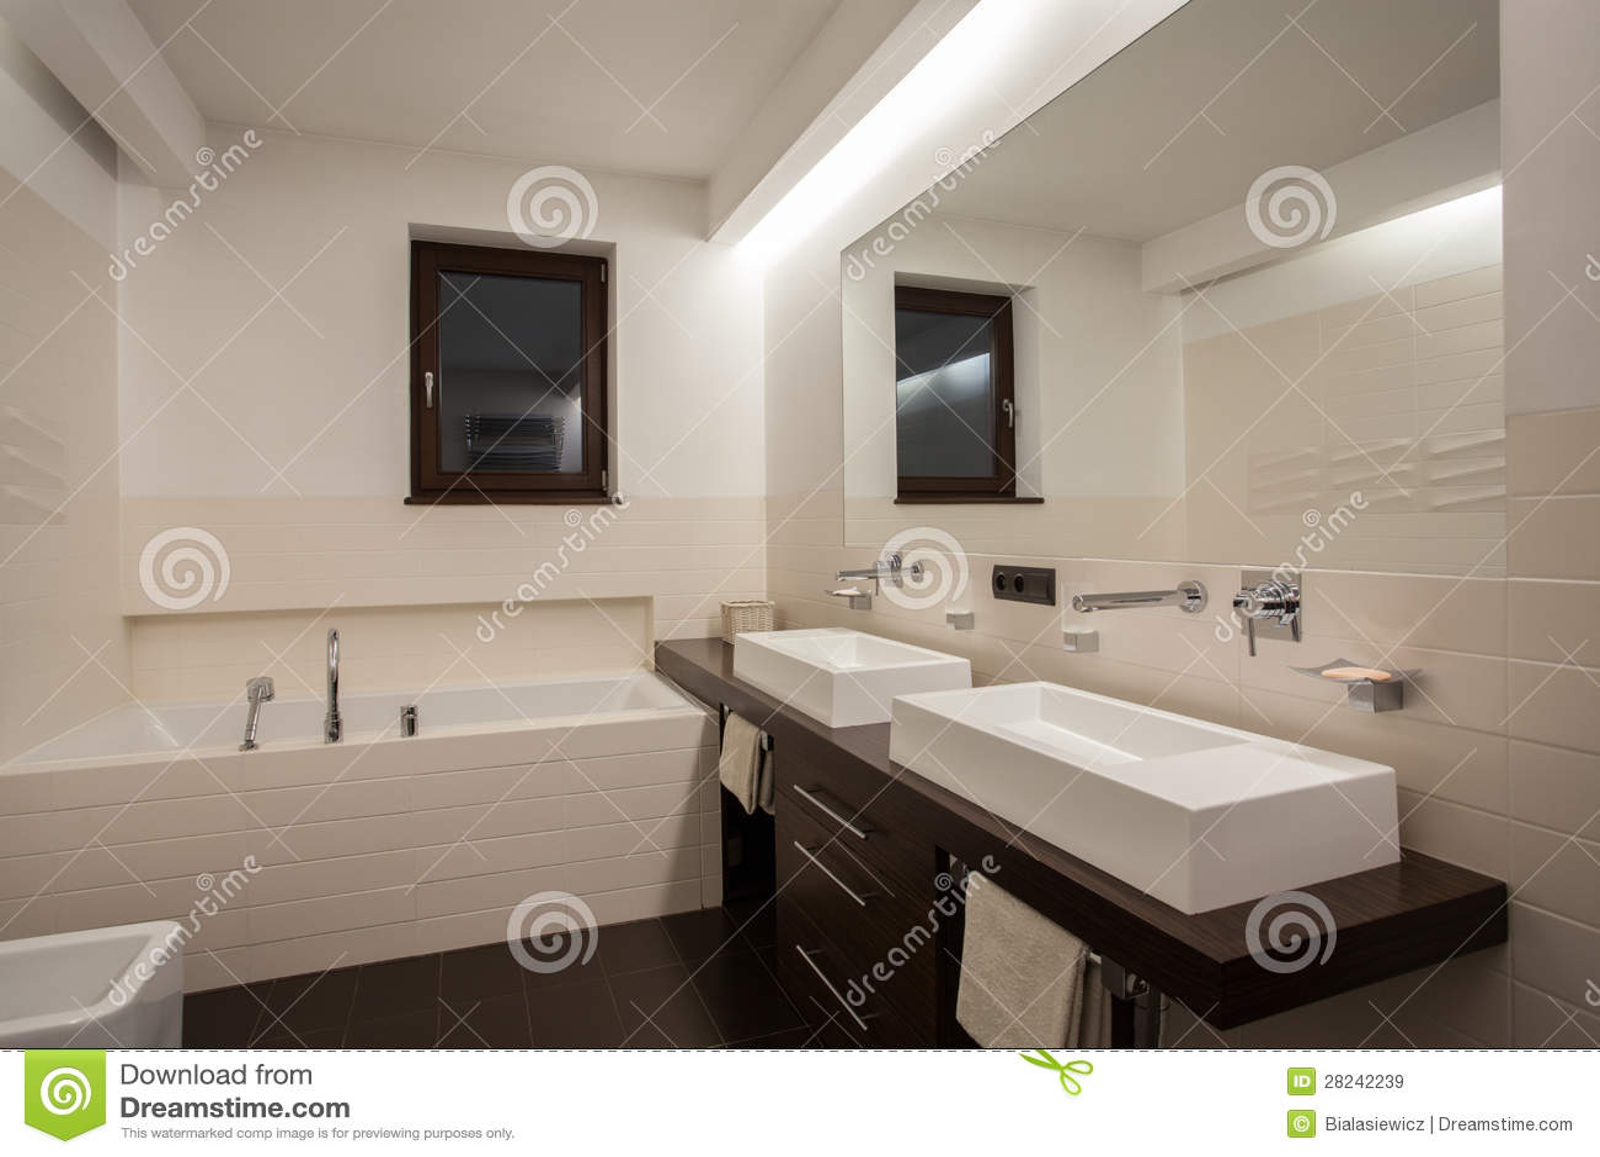 travertine house modern bathroom stock image image. Black Bedroom Furniture Sets. Home Design Ideas